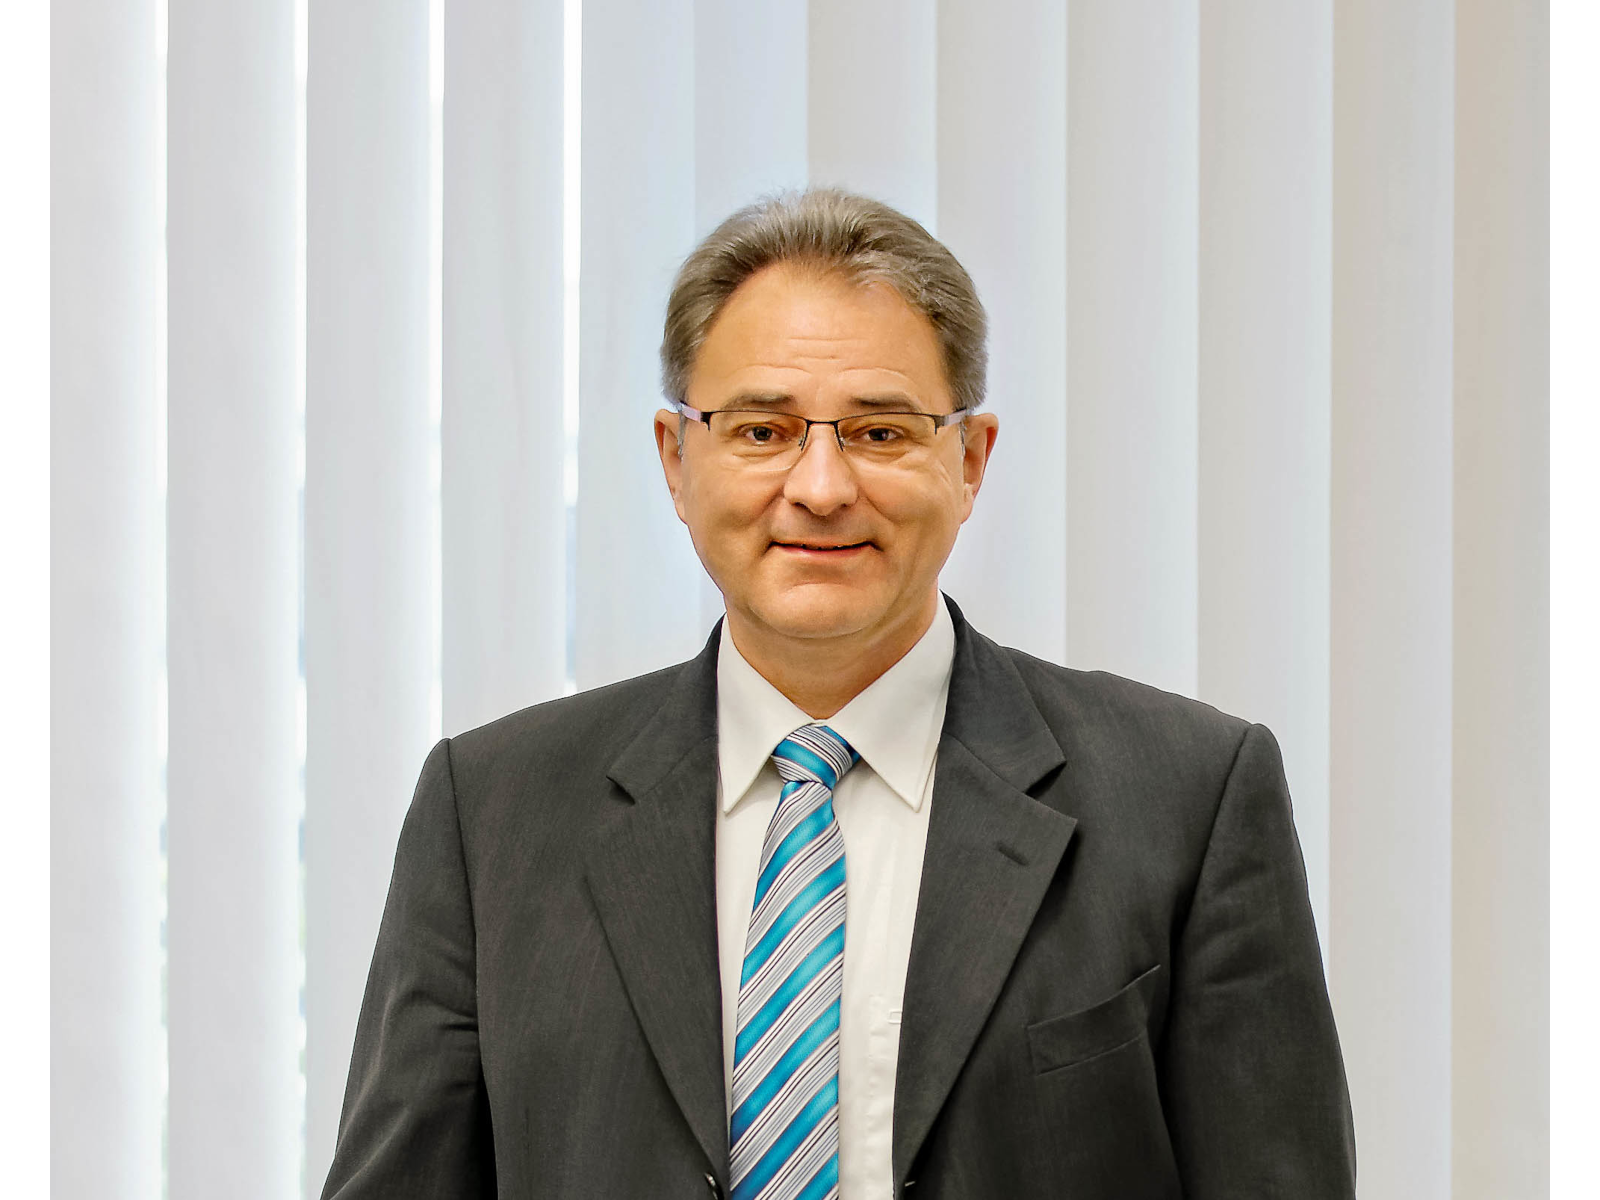 Prof. Dr. Wolfgang Reif